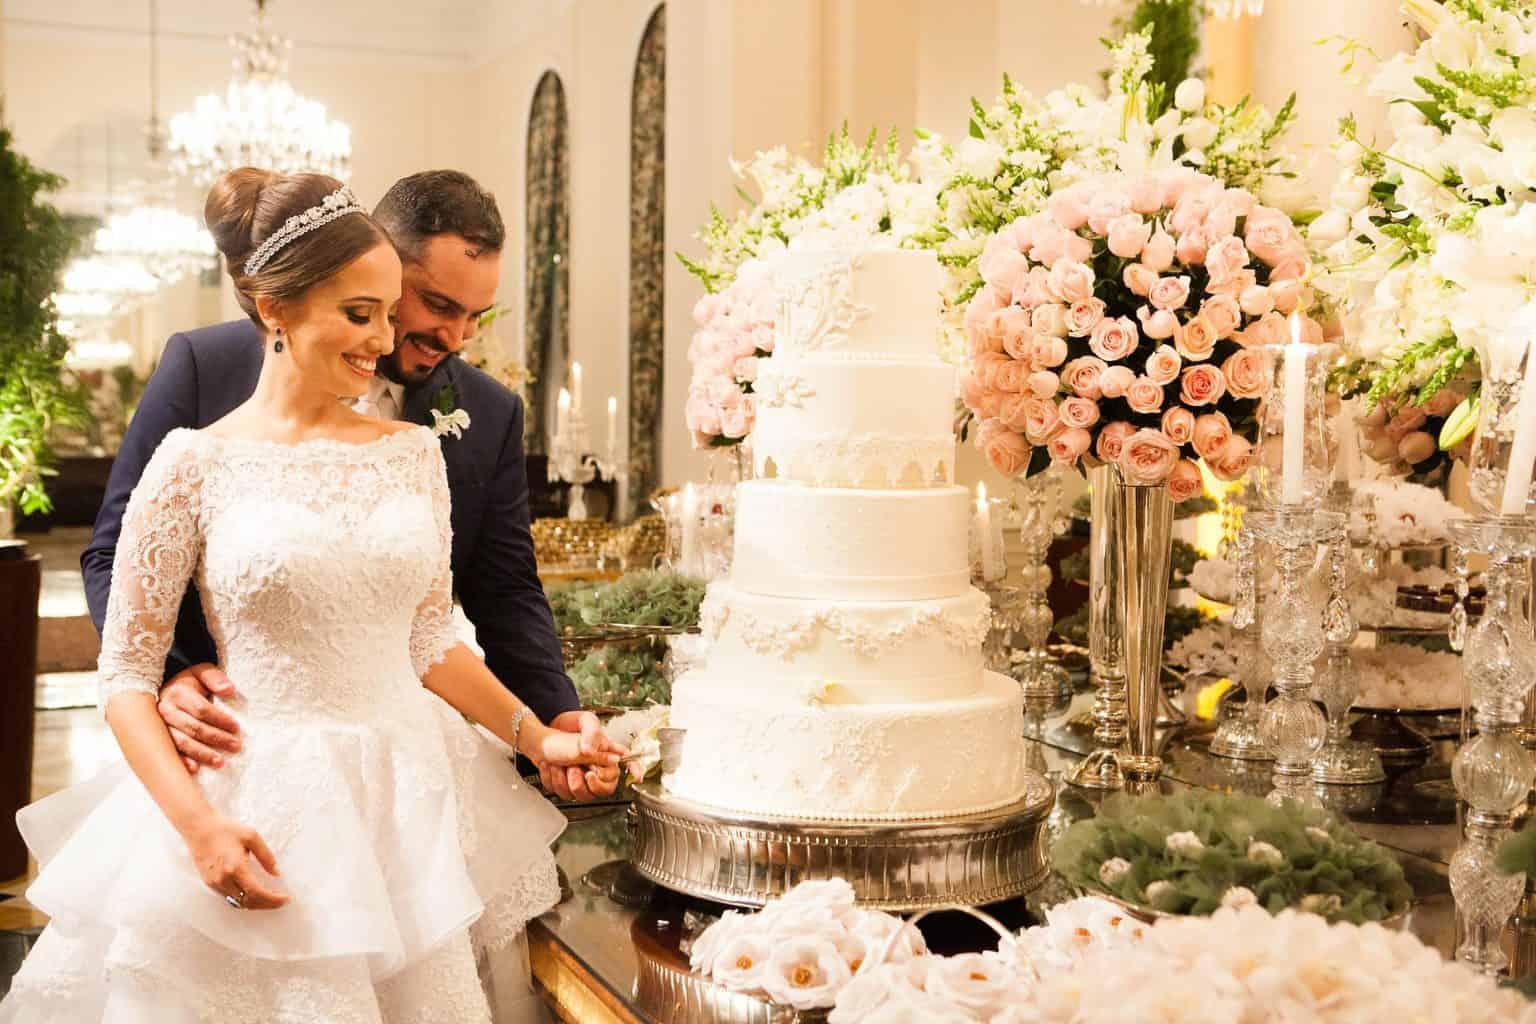 Casamento-Clássico-Casamento-tradicional-Copacabana-Palace-Corte-do-bolo-Monica-Roias-Ribas-Foto-e-Vídeo-Silvio-Cruz-Tuanny-e-Bernardo-CaseMe